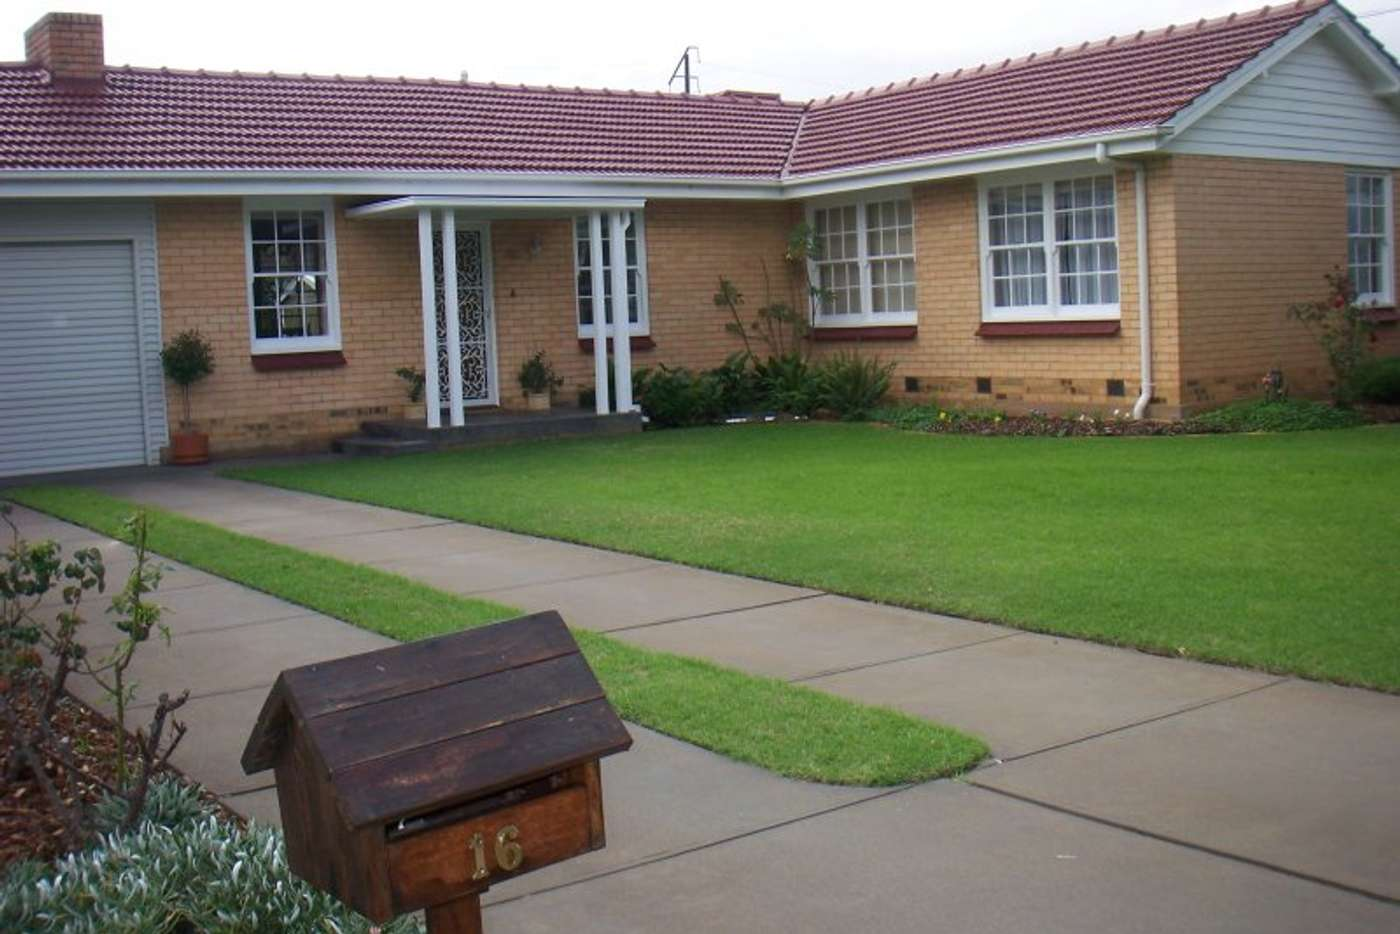 Main view of Homely house listing, 16 Hamilton Street, Vale Park SA 5081